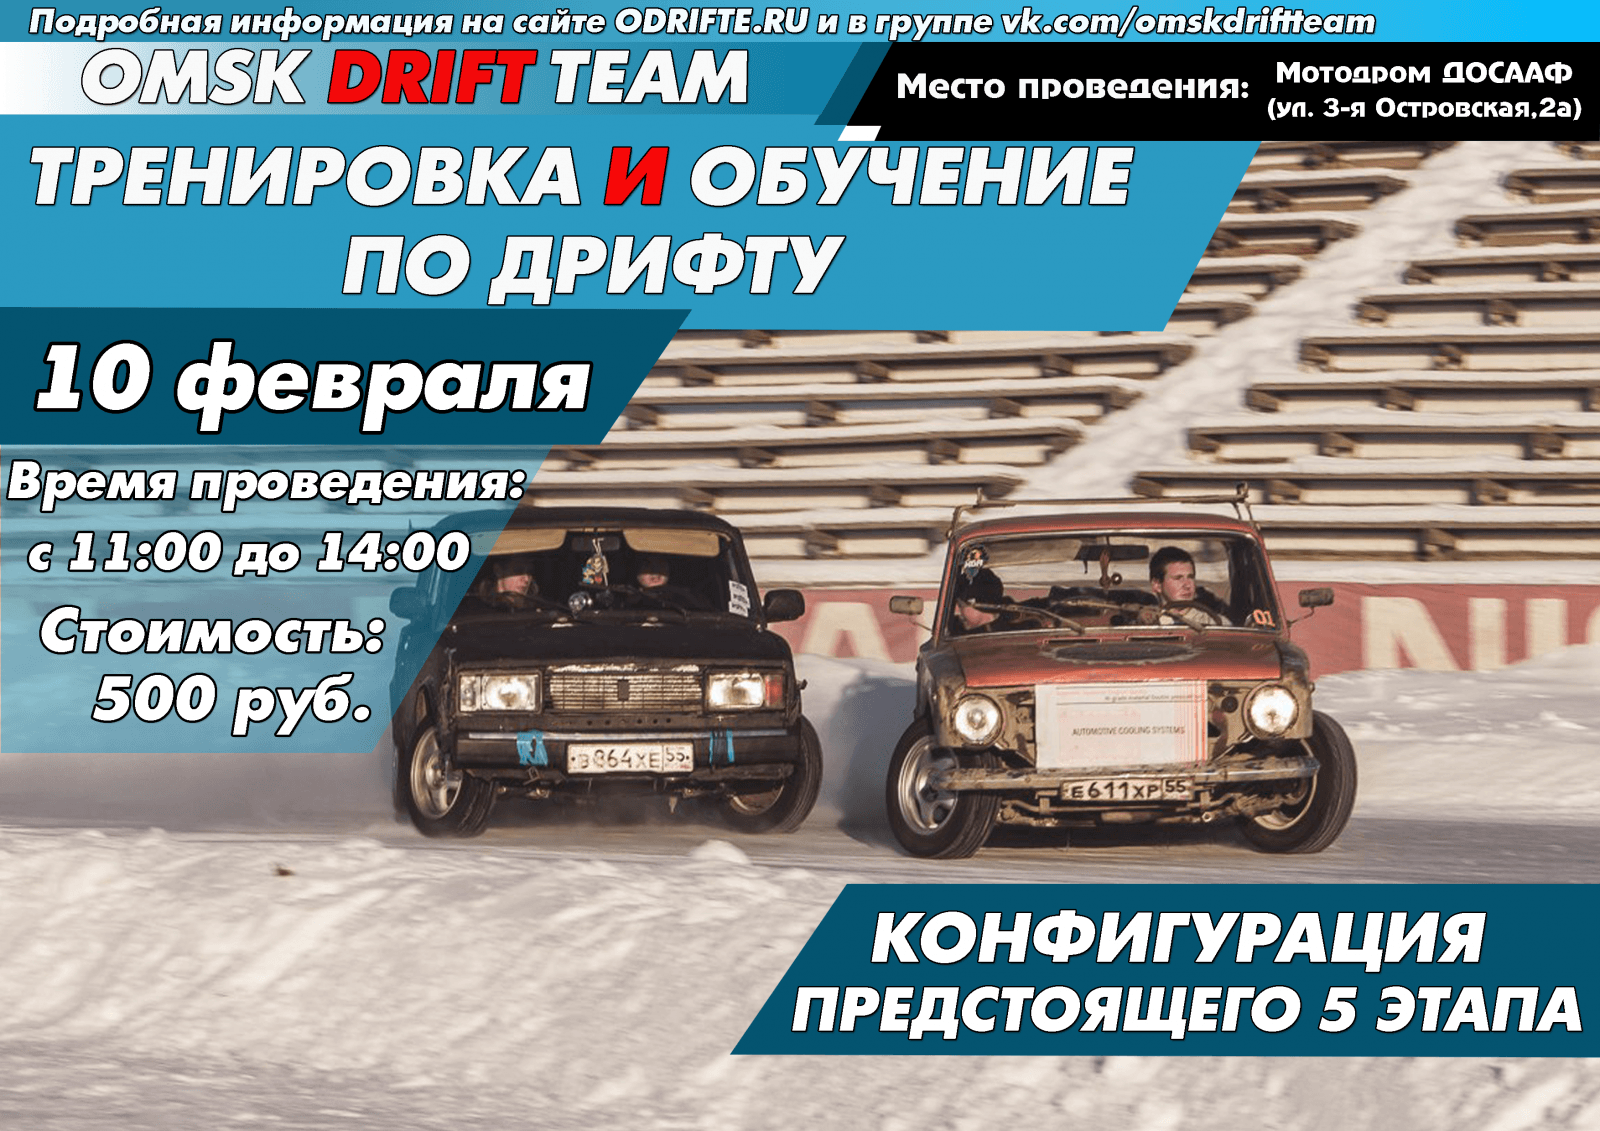 Тренировка и обучение по дрифту от Omsk Drift Team